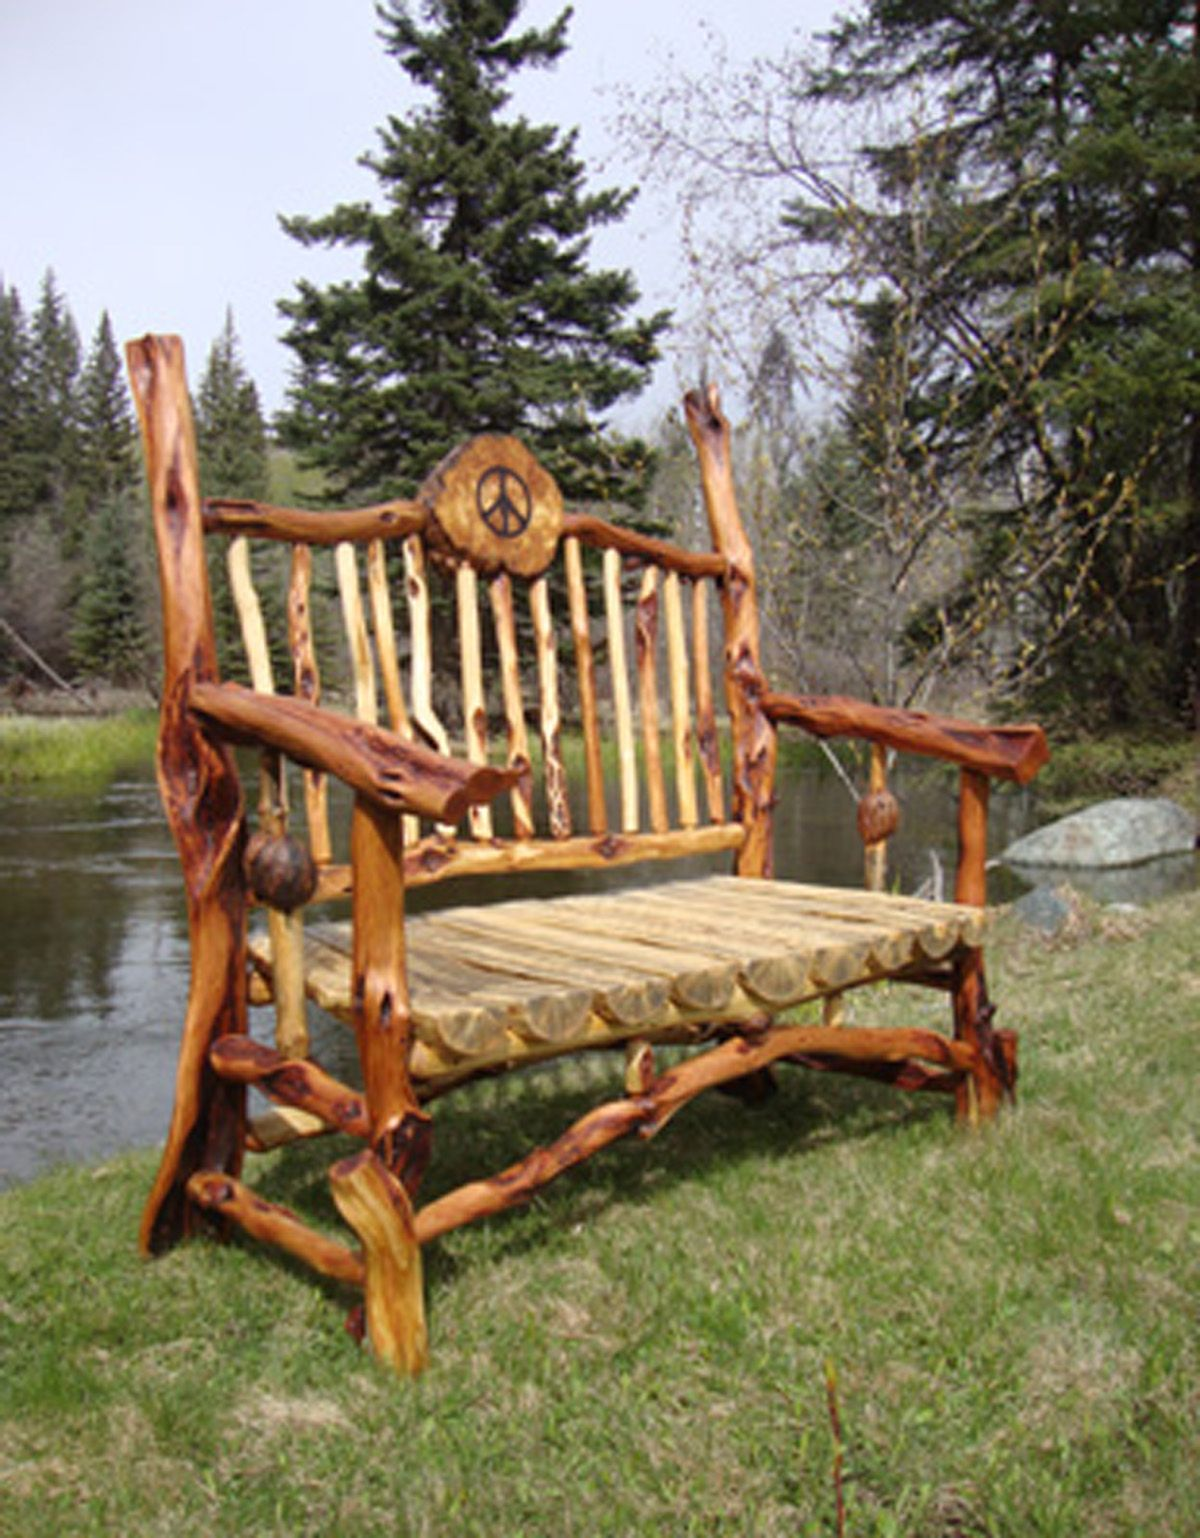 Tree Branch Rocking Chair Indoor Zero Gravity Log Diamond Willow Furniture